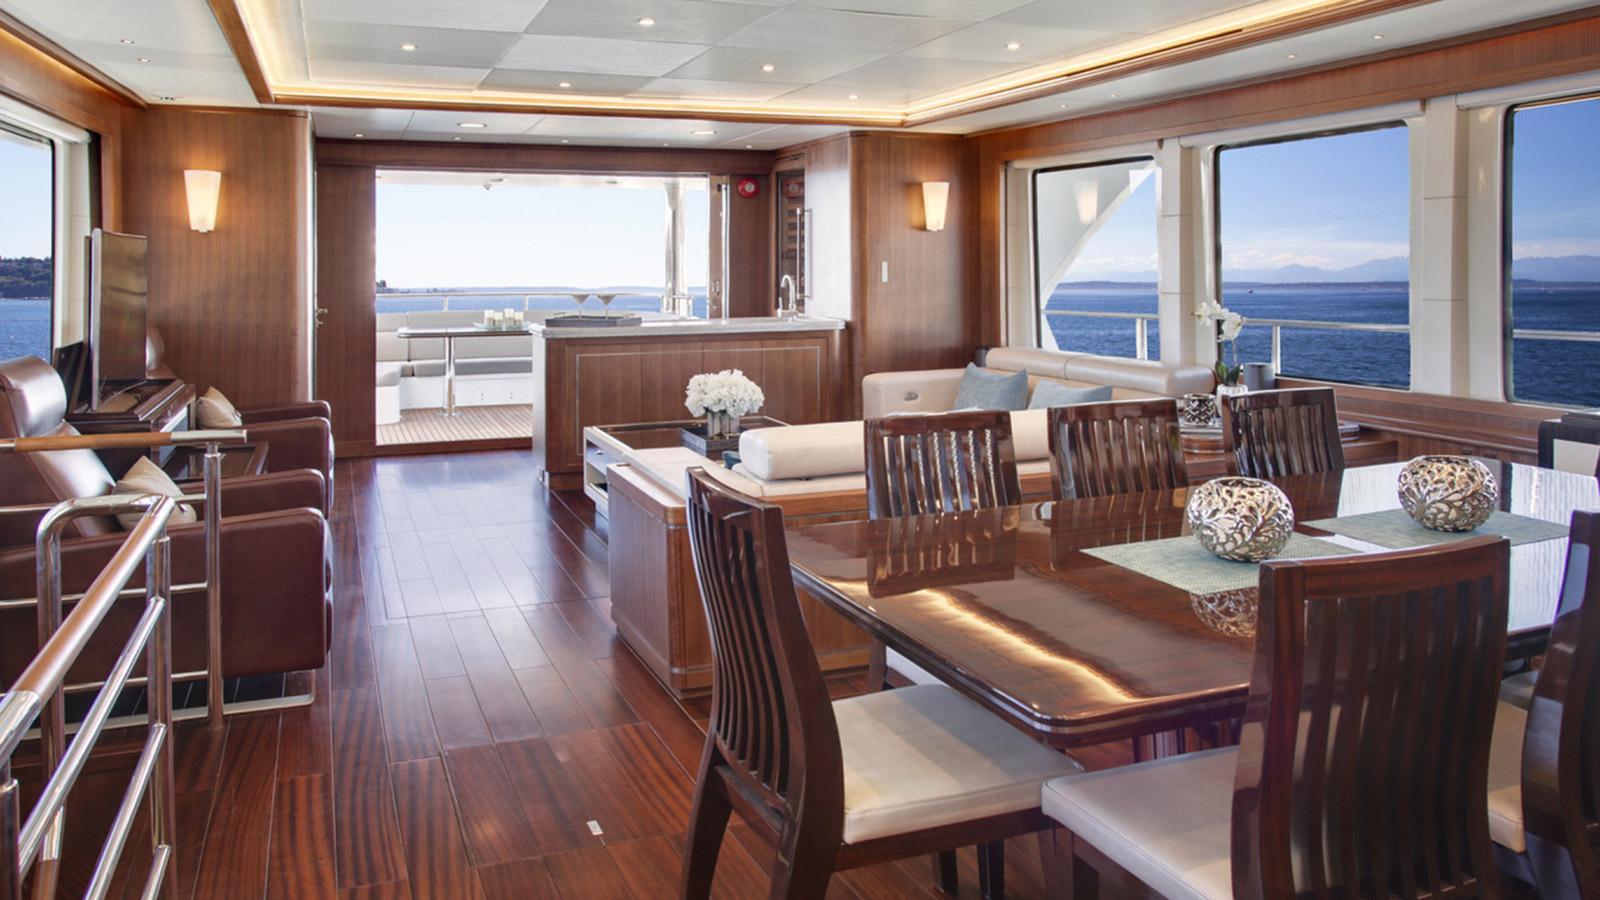 viking hardwood floors charlotte nc of https www boatinternational com yacht market intelligence brokerage within xiqqcchjrq2kmlntz2ts watta ryde yacht selene skylounge 2560x1440